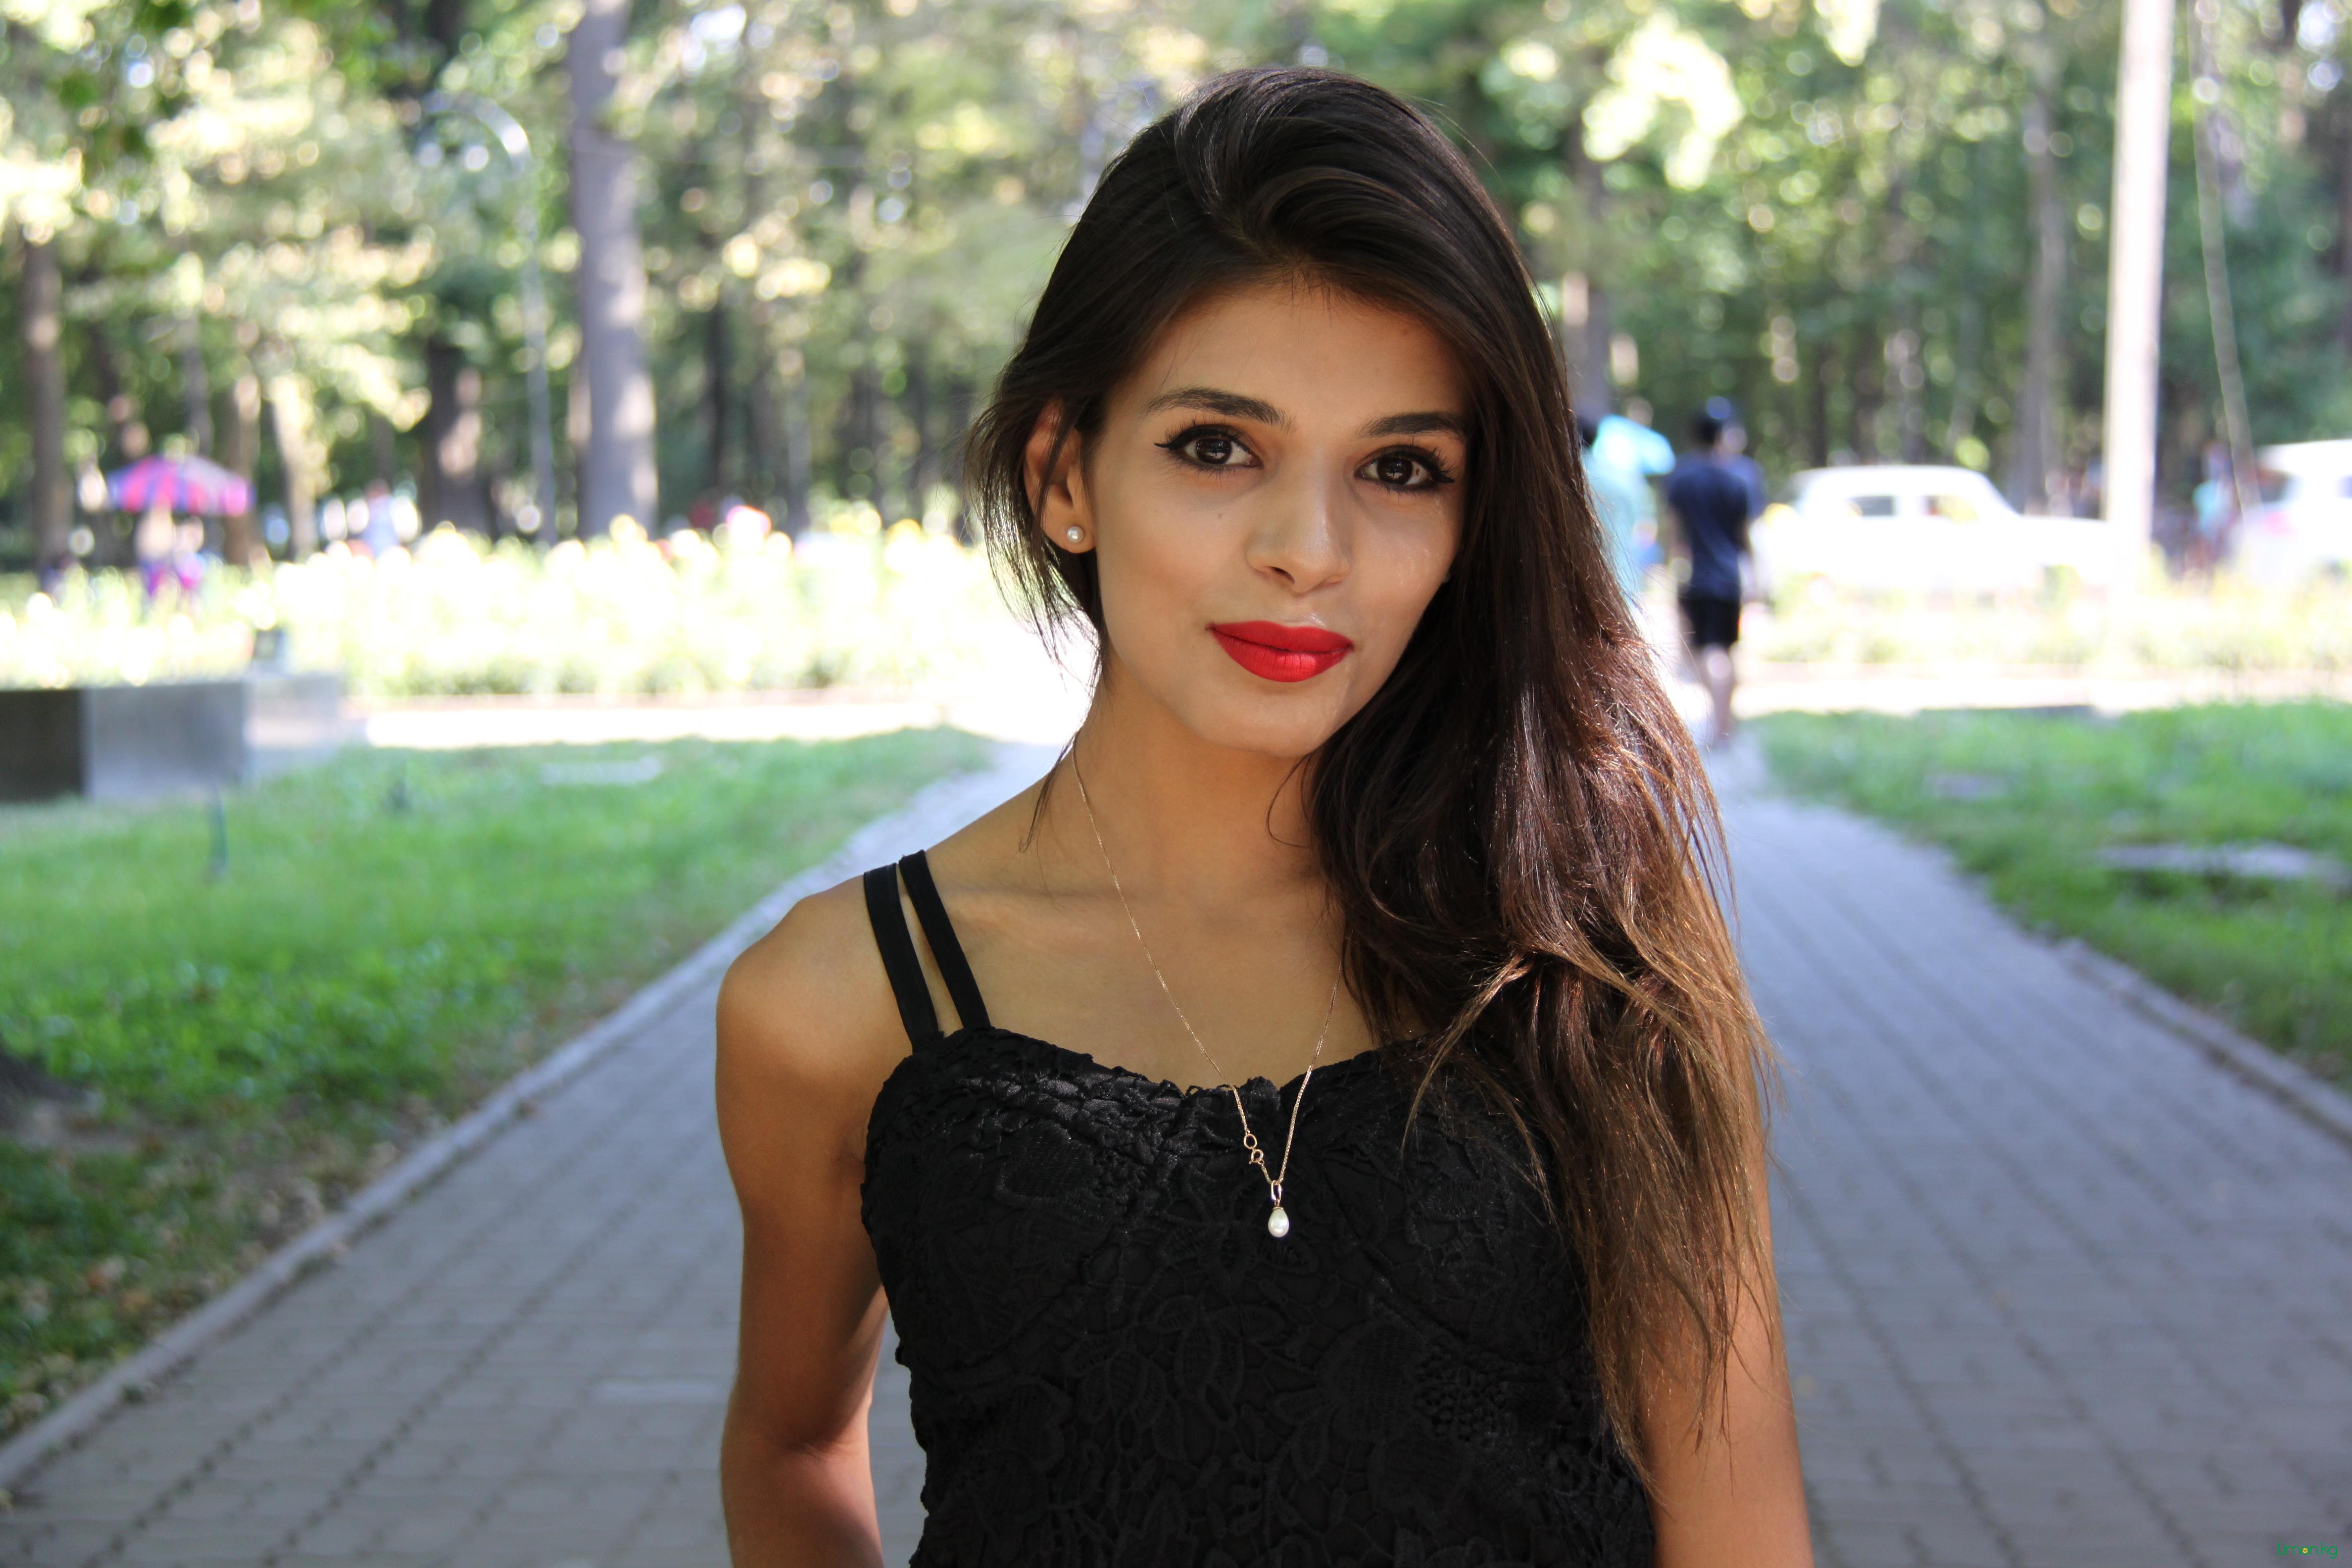 Наиля Камарли, 24 лет, менеджер BTL